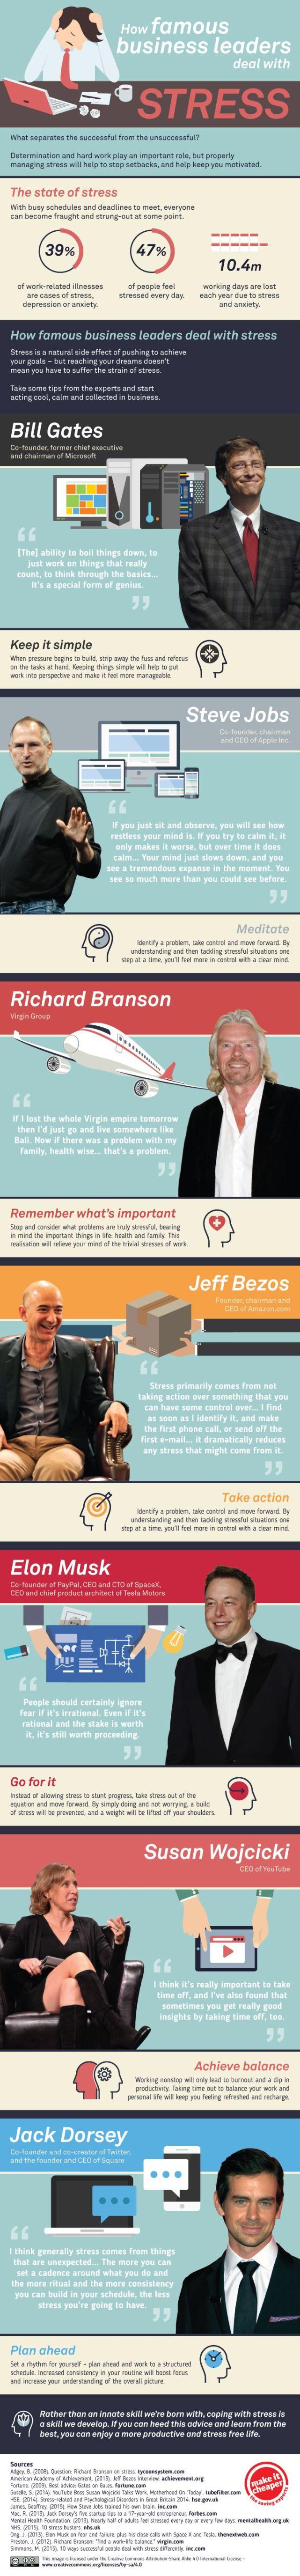 how successful entrepreneurs beat stress